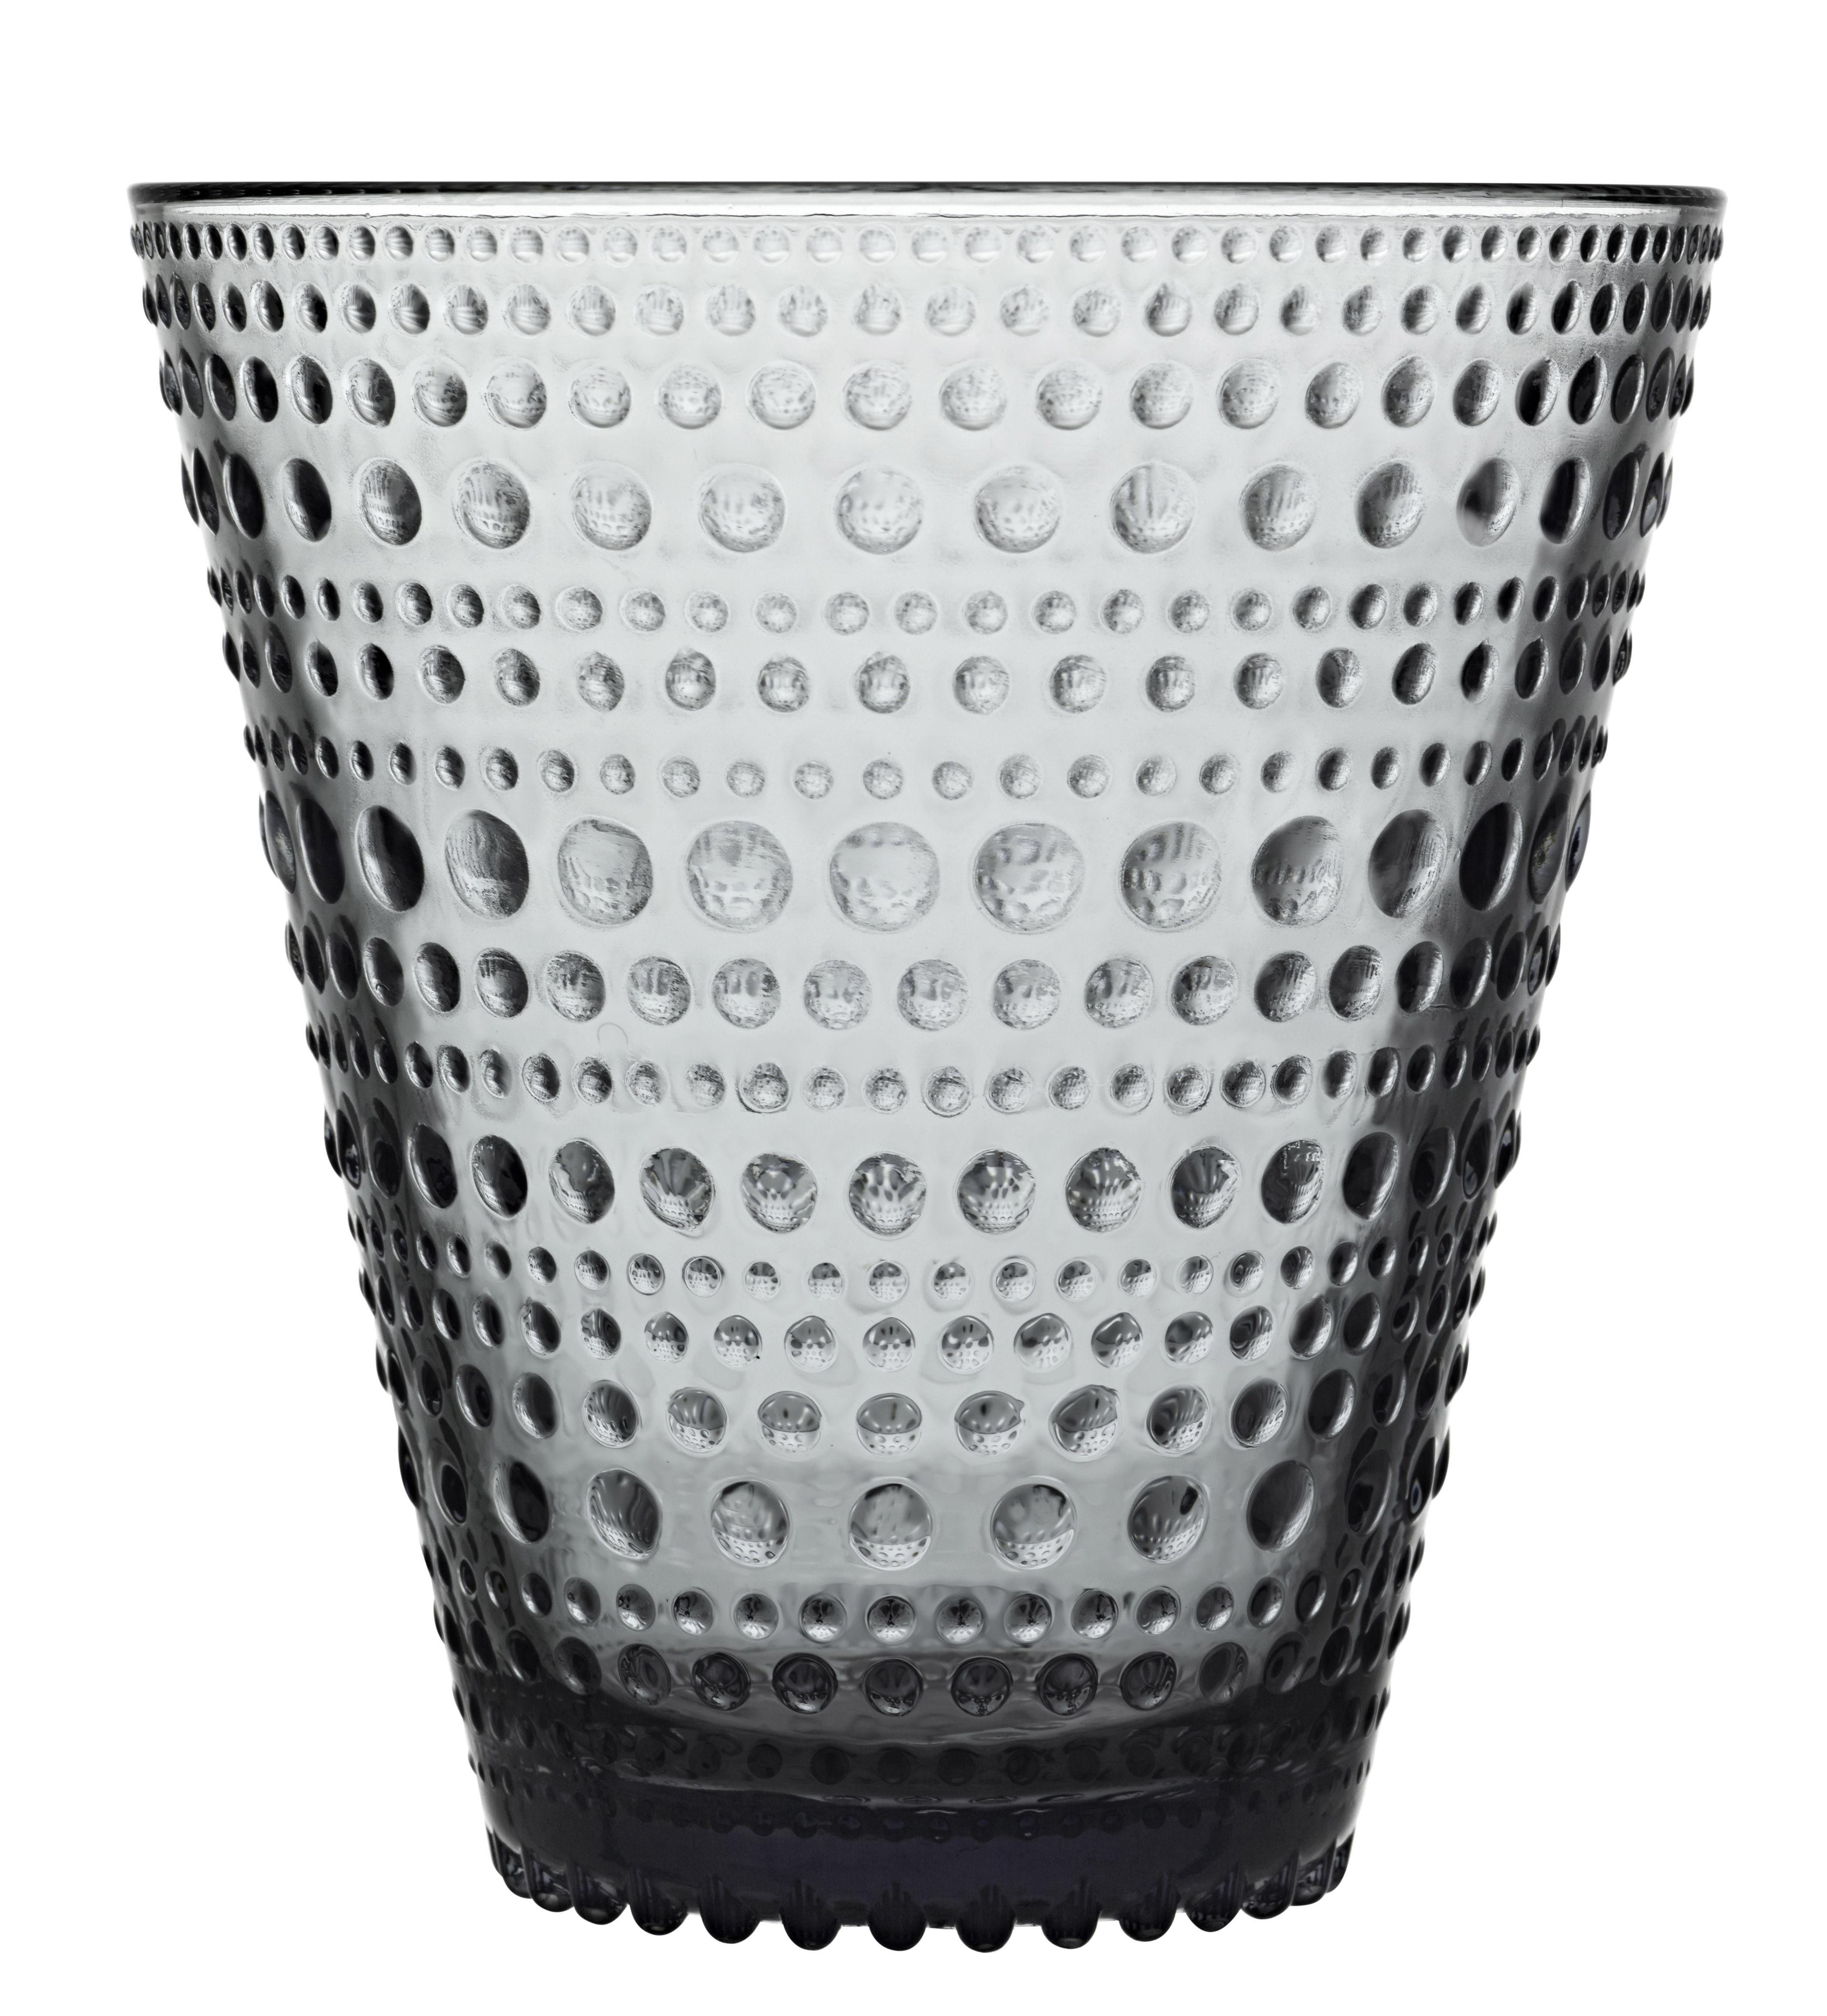 Tableware - Wine Glasses & Glassware - Kastehelmi Glass - Set of 2 glasses - 30 cl by Iittala - Grey - Pressed glass